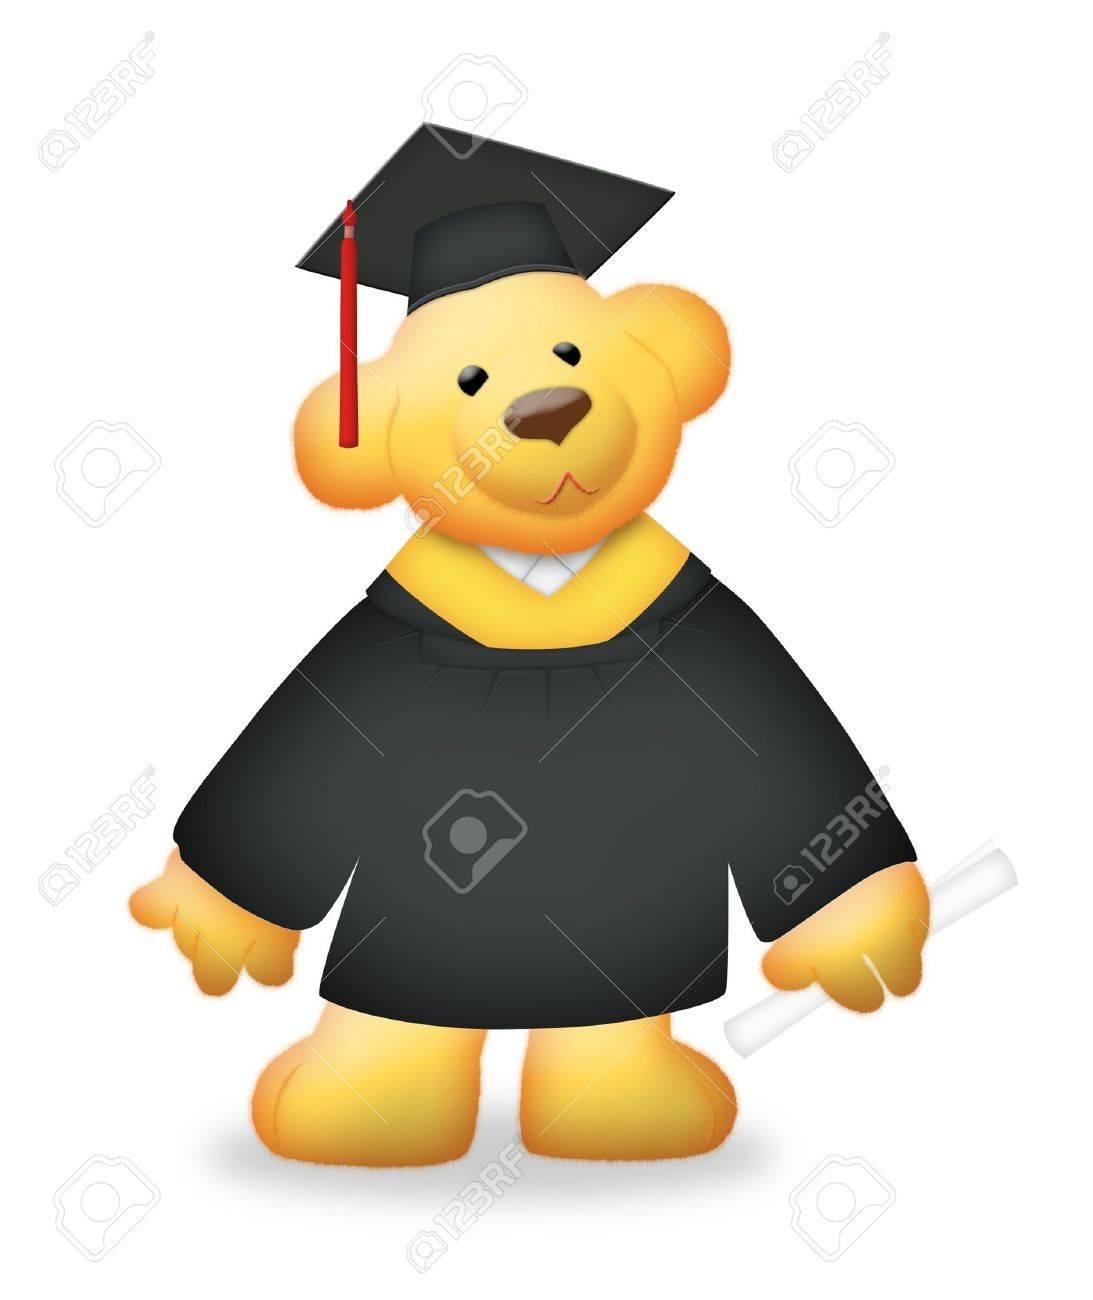 Graduation teddy bear wearing toga. - 9071915